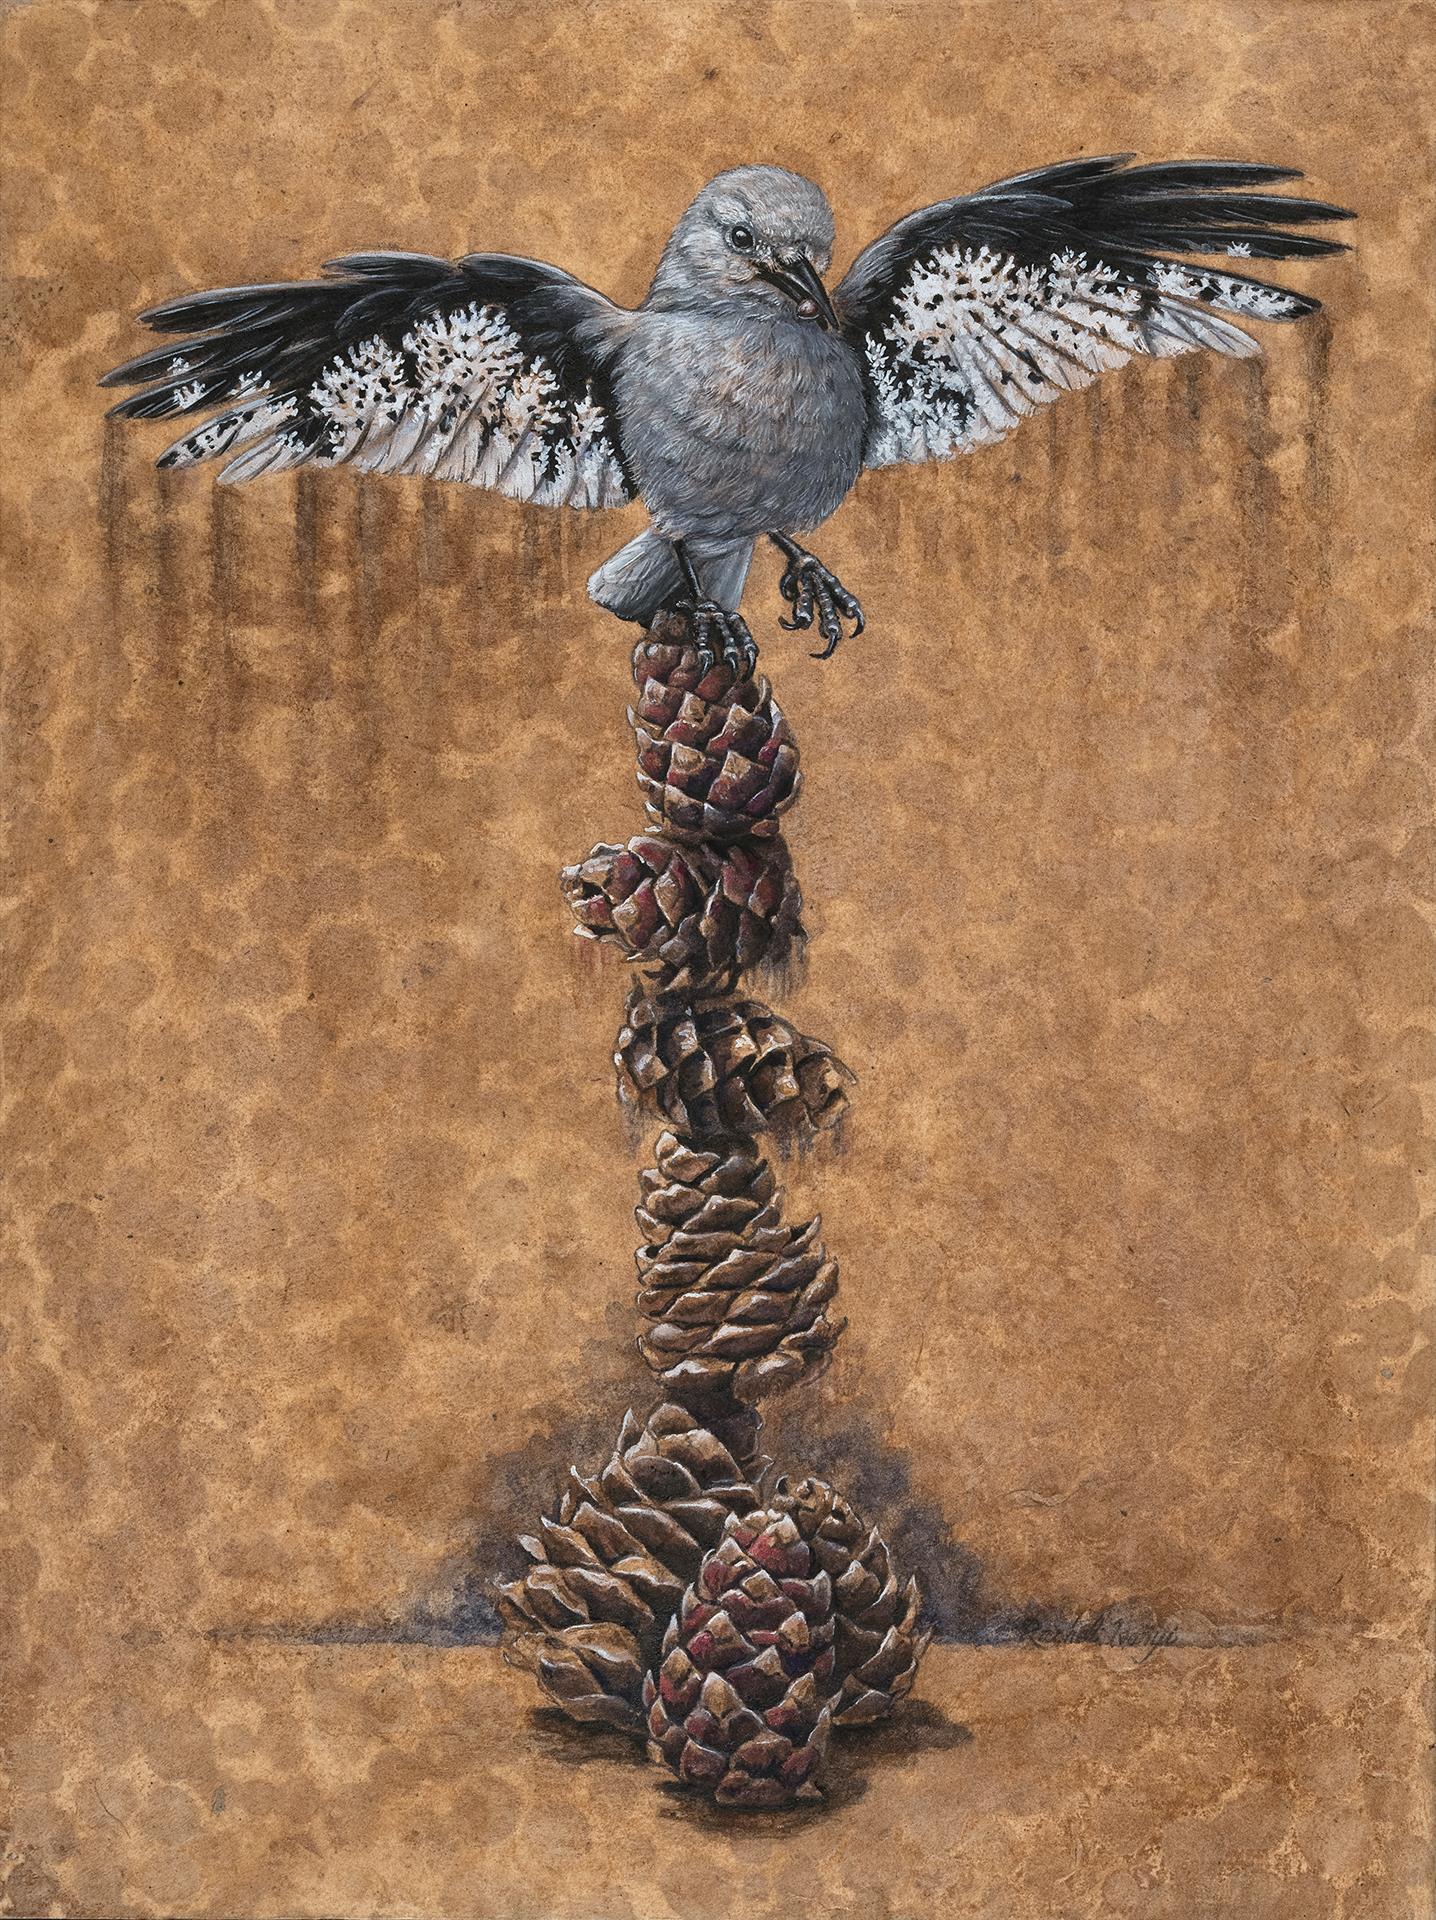 A Delicate Balance: Clark's Nutcracker and Whitebark Pine, Rachel Ivanyi